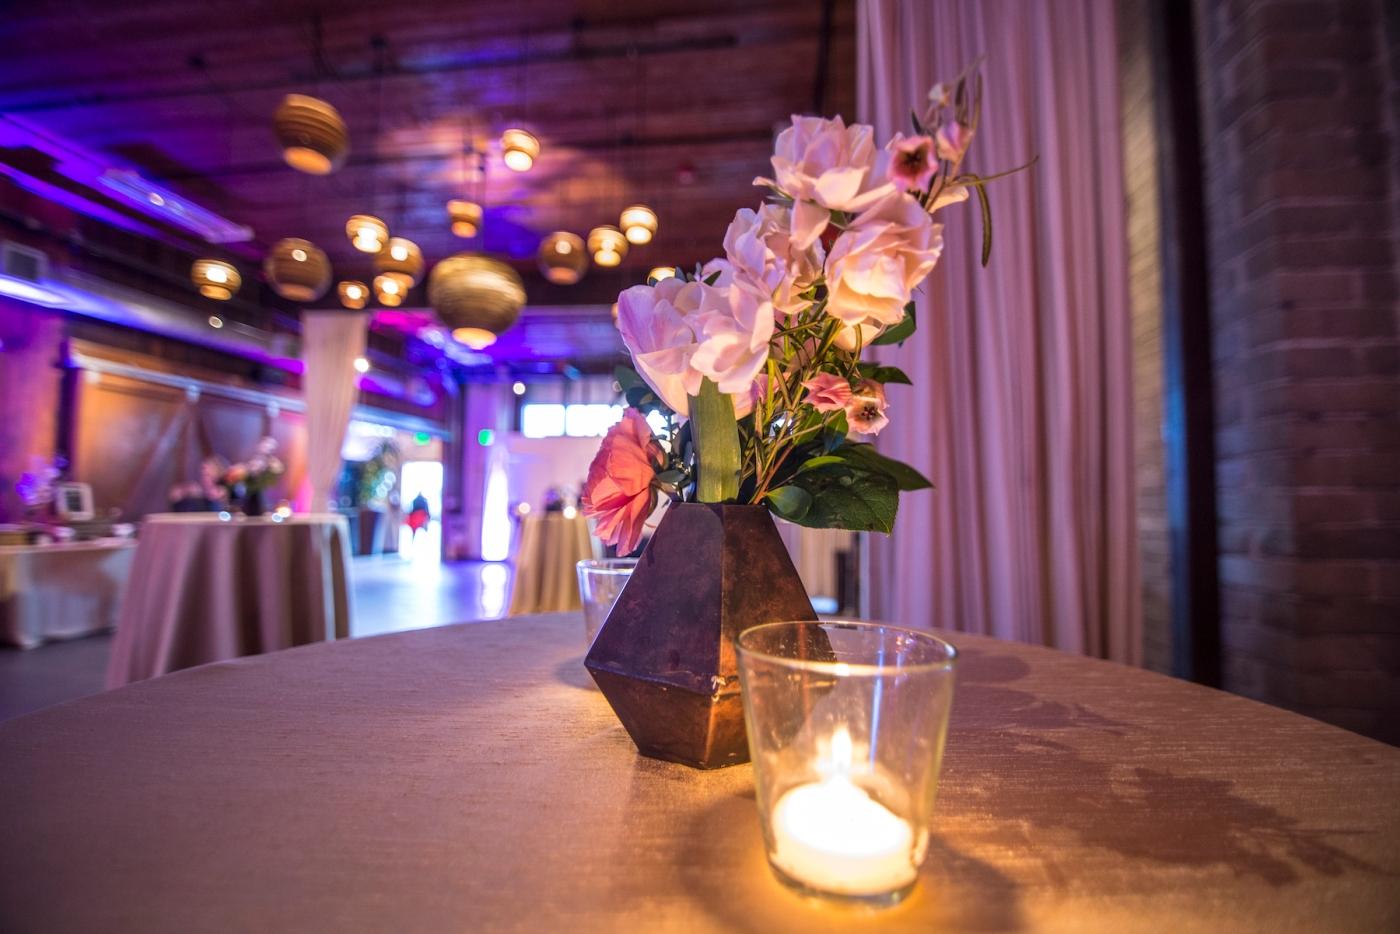 photography_by_jane_speleers_2017_wedding_show_i_do_sodo_within_designed_by_melody_davisdsc_0876